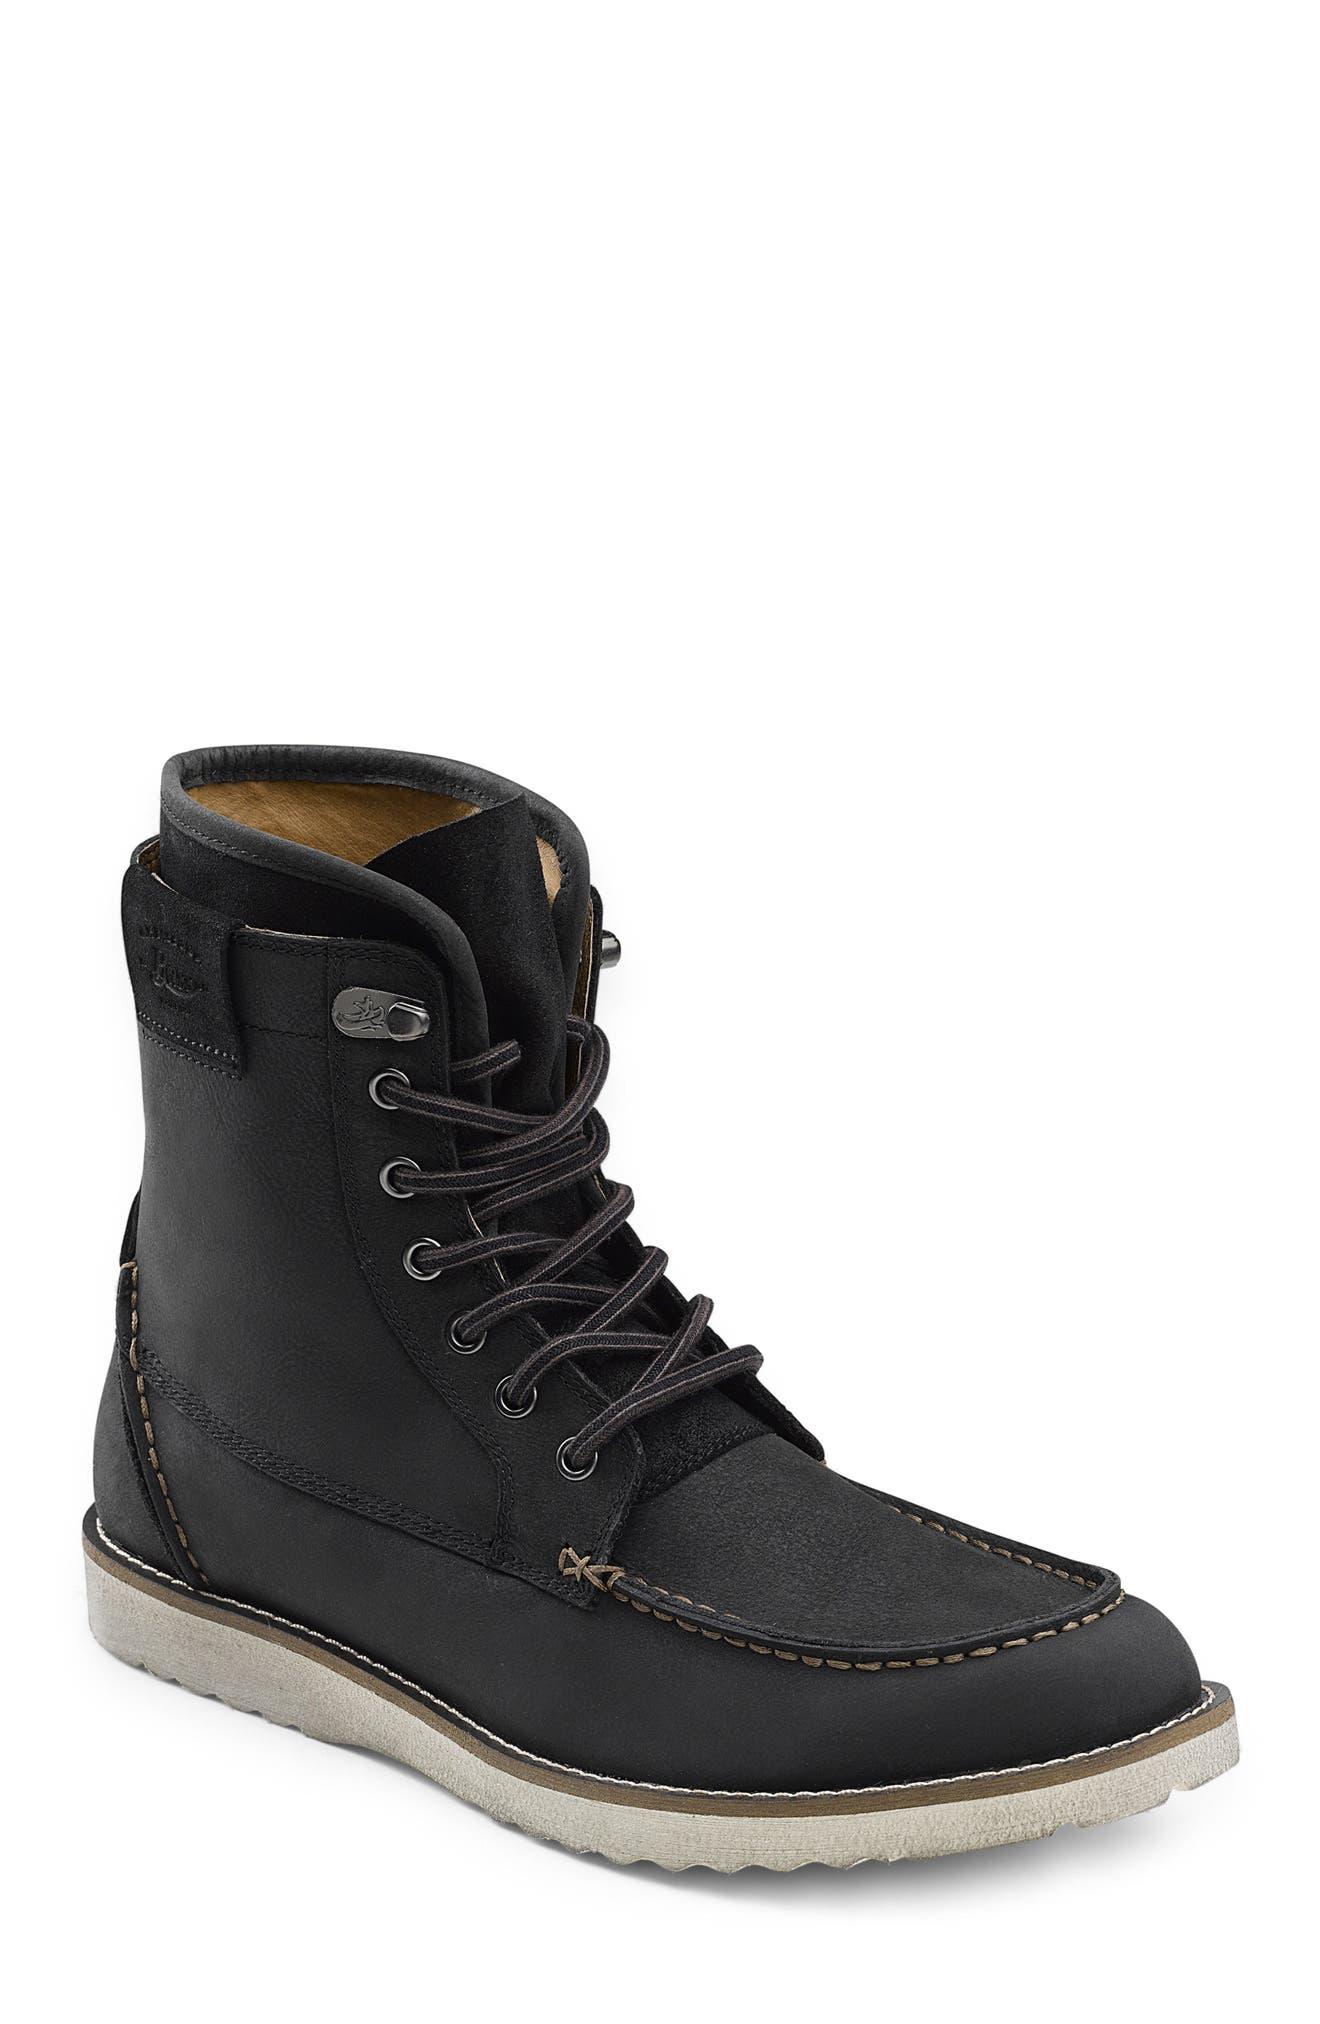 Shane Moc Toe Boot,                         Main,                         color,